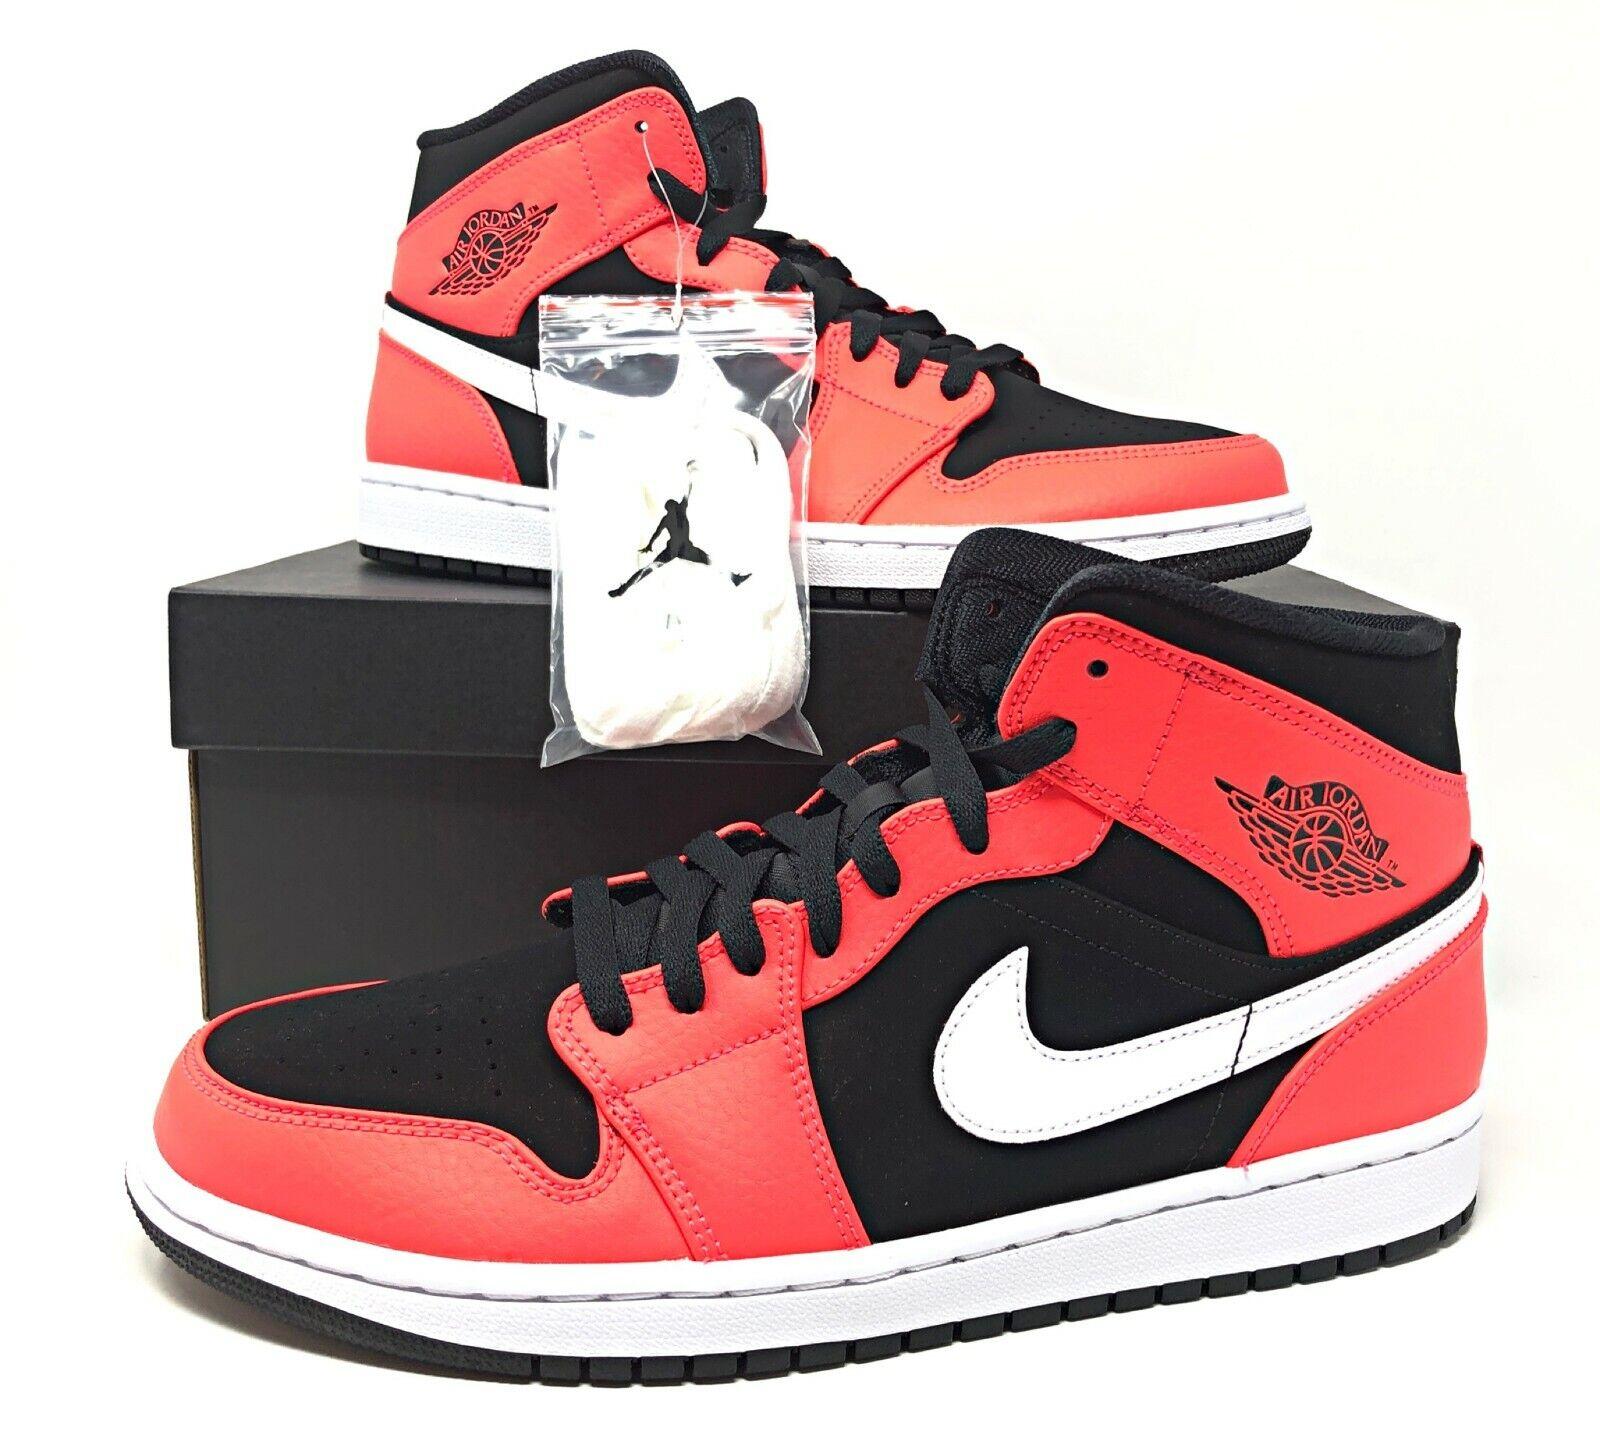 Nike Air Jordan 1 Mid BlackInfrared 23 White Mens Basketball Shoes 554724 061